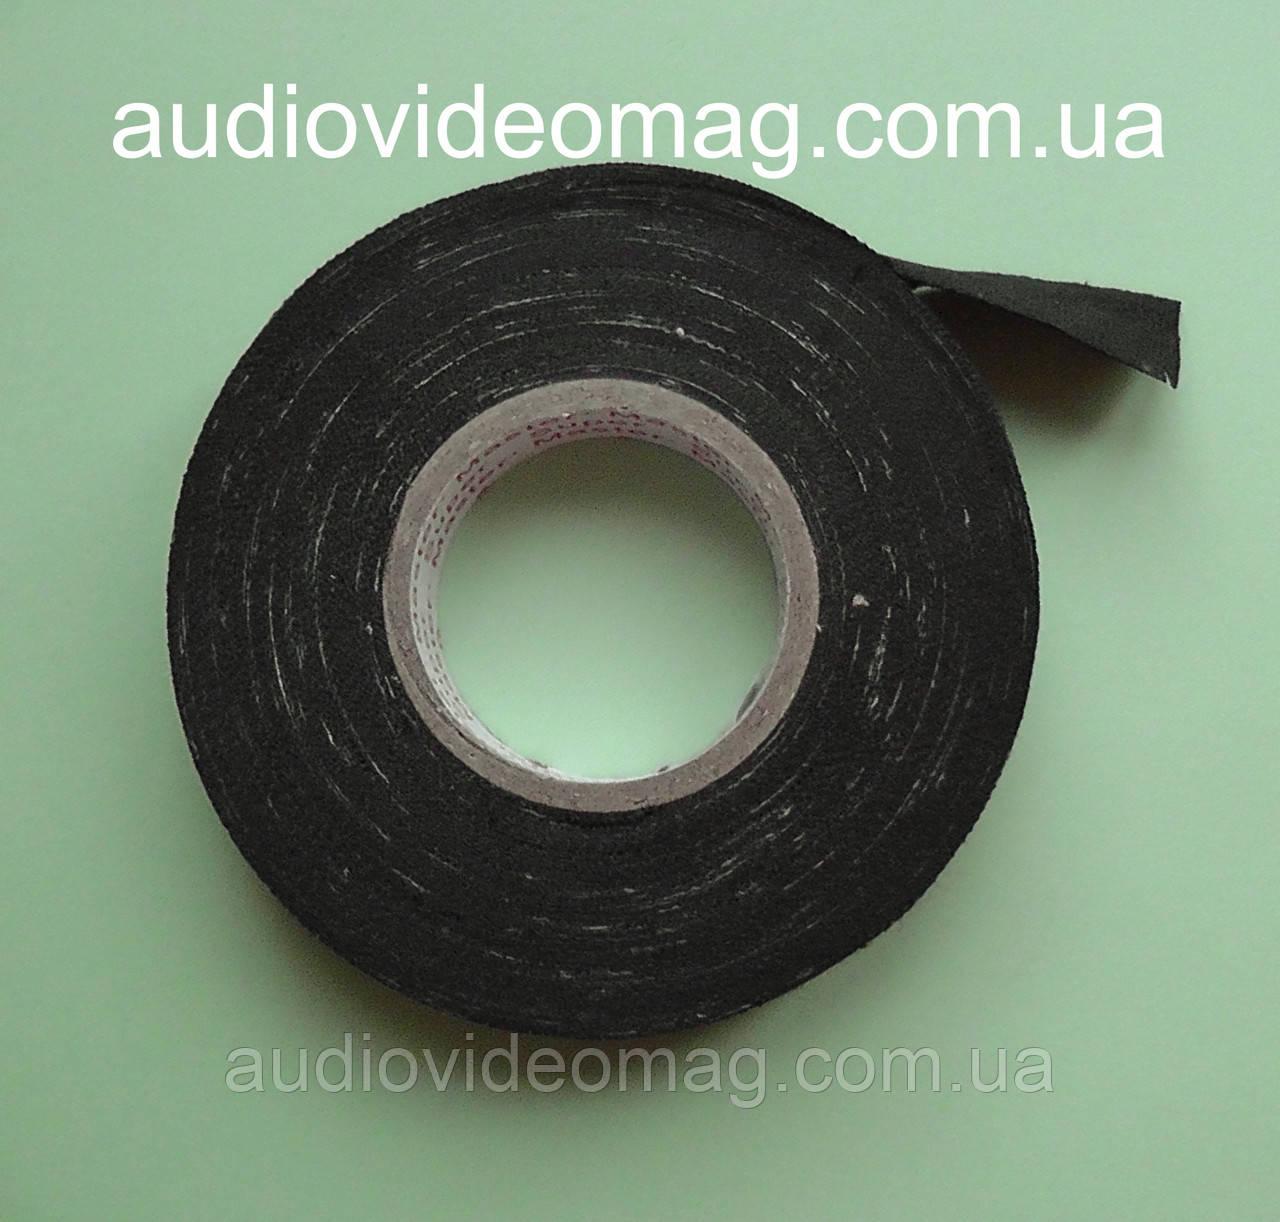 Изолента тканевая (ХБ основа), длина 20 метров, ширина 17мм, цвет - черный